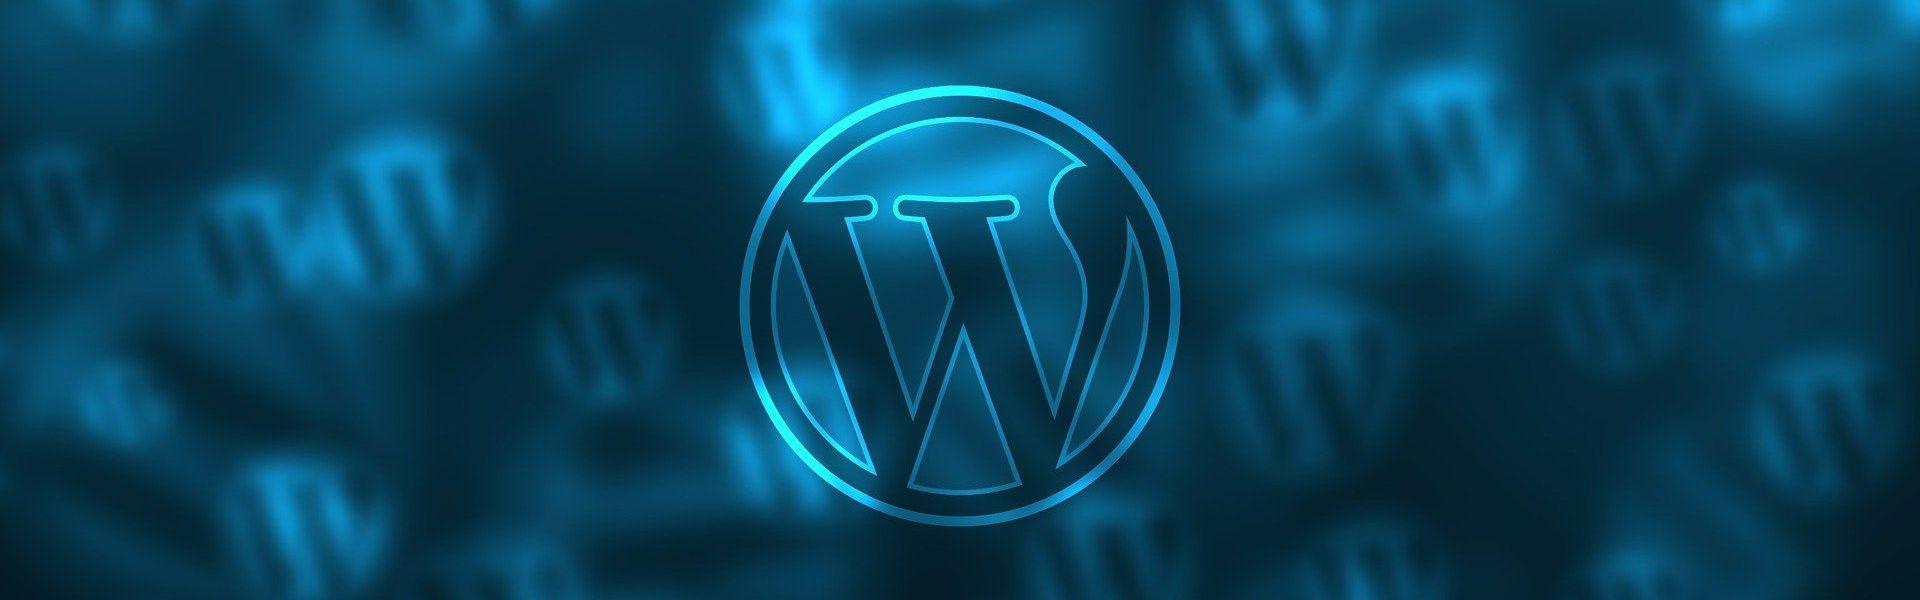 WordPress-Seite hinter Nginx ReverseProxy